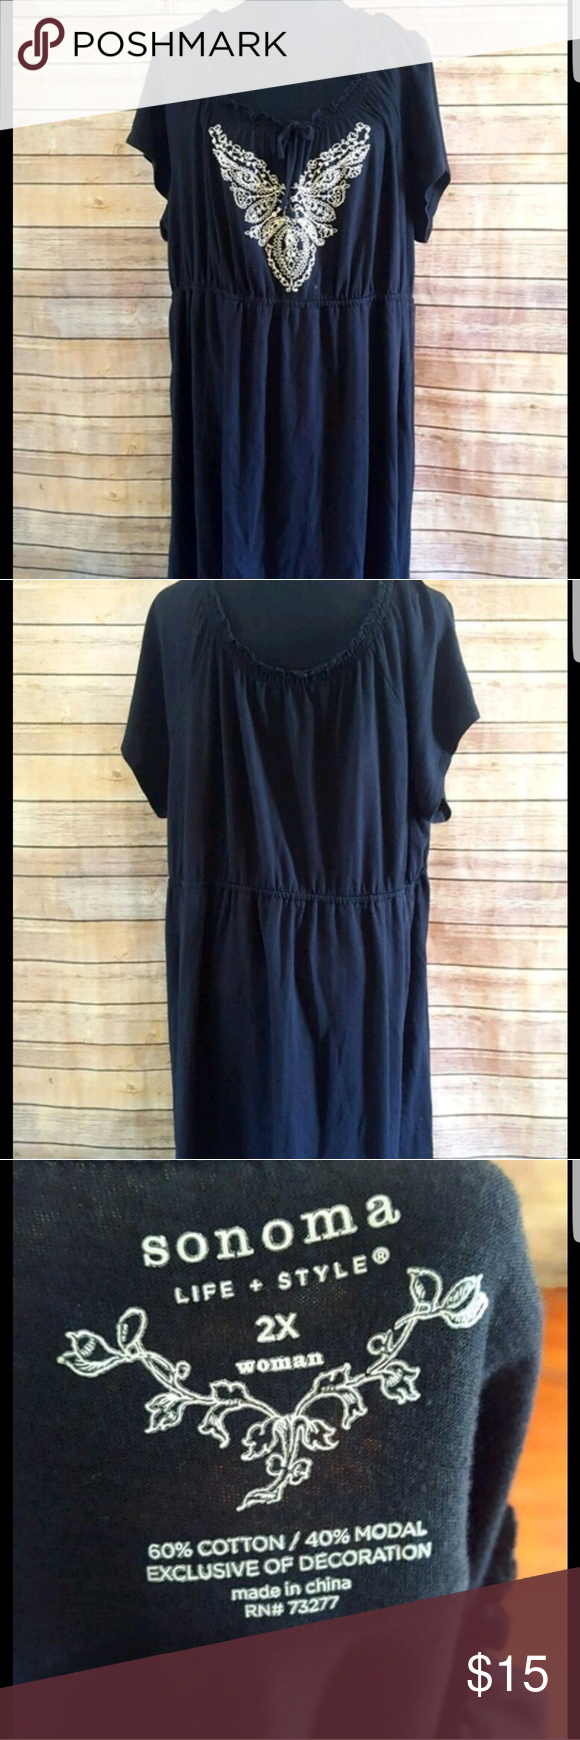 2x Black Summer Dress Thank You So Much Dresses Summer Black Dress Summer Dresses Dresses [ 1740 x 580 Pixel ]